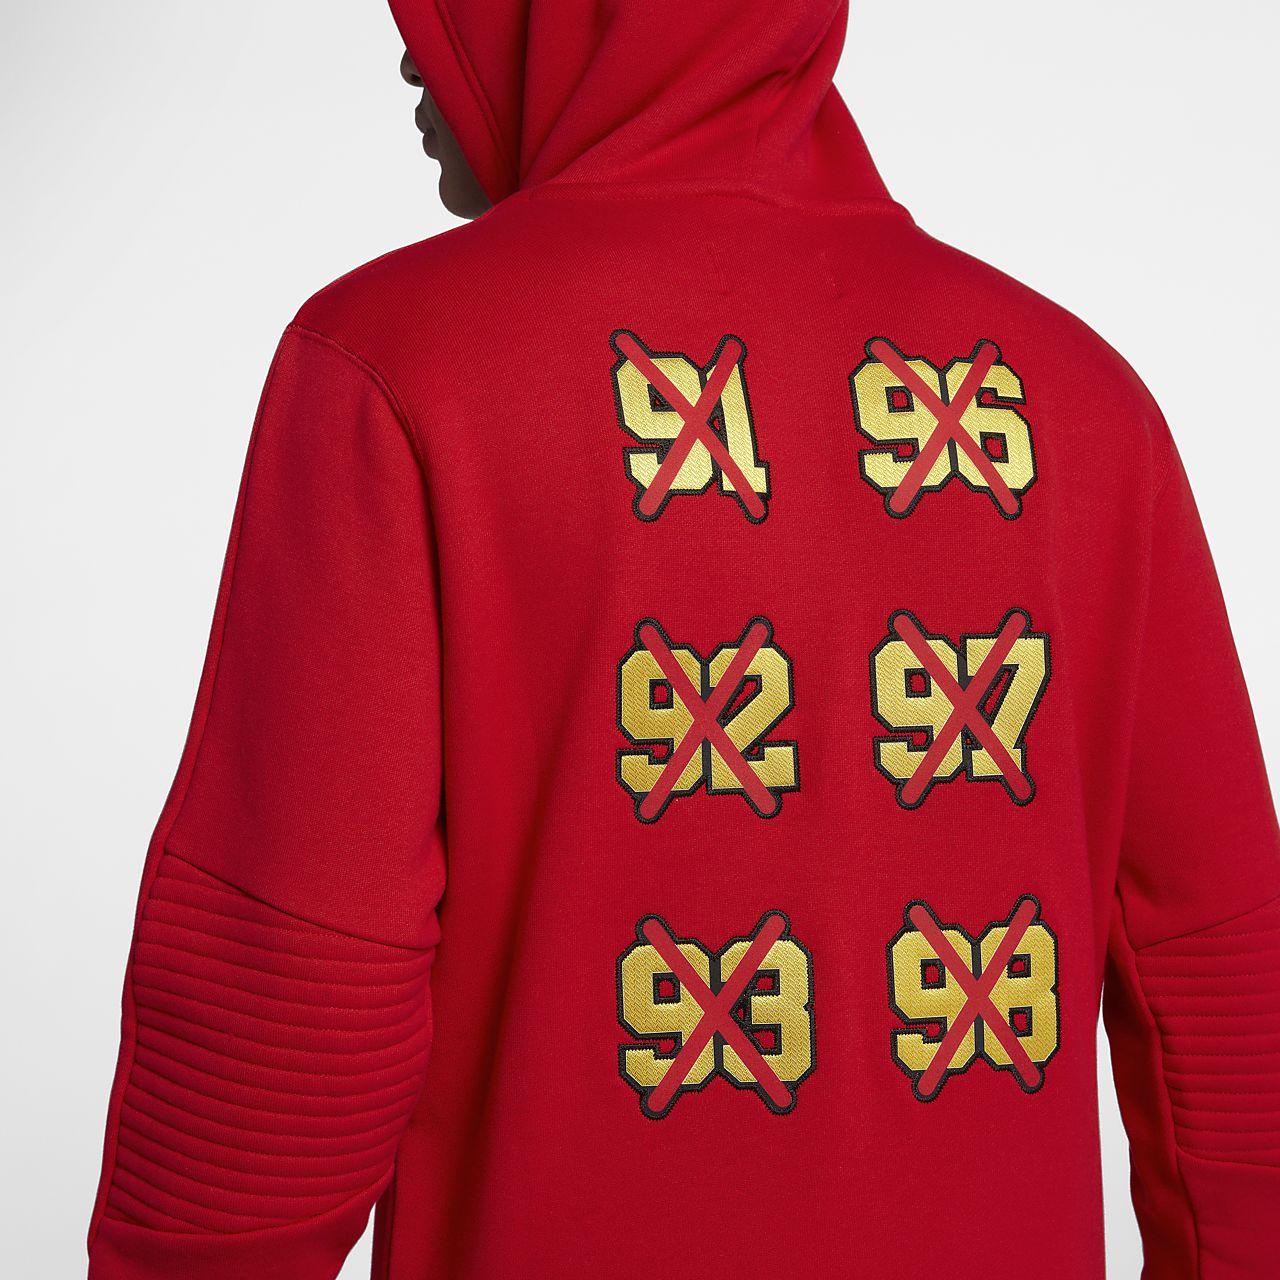 d648a7dba5 Jordan Sportswear Men's Hockey Pullover Hoodie. Nike.com AU